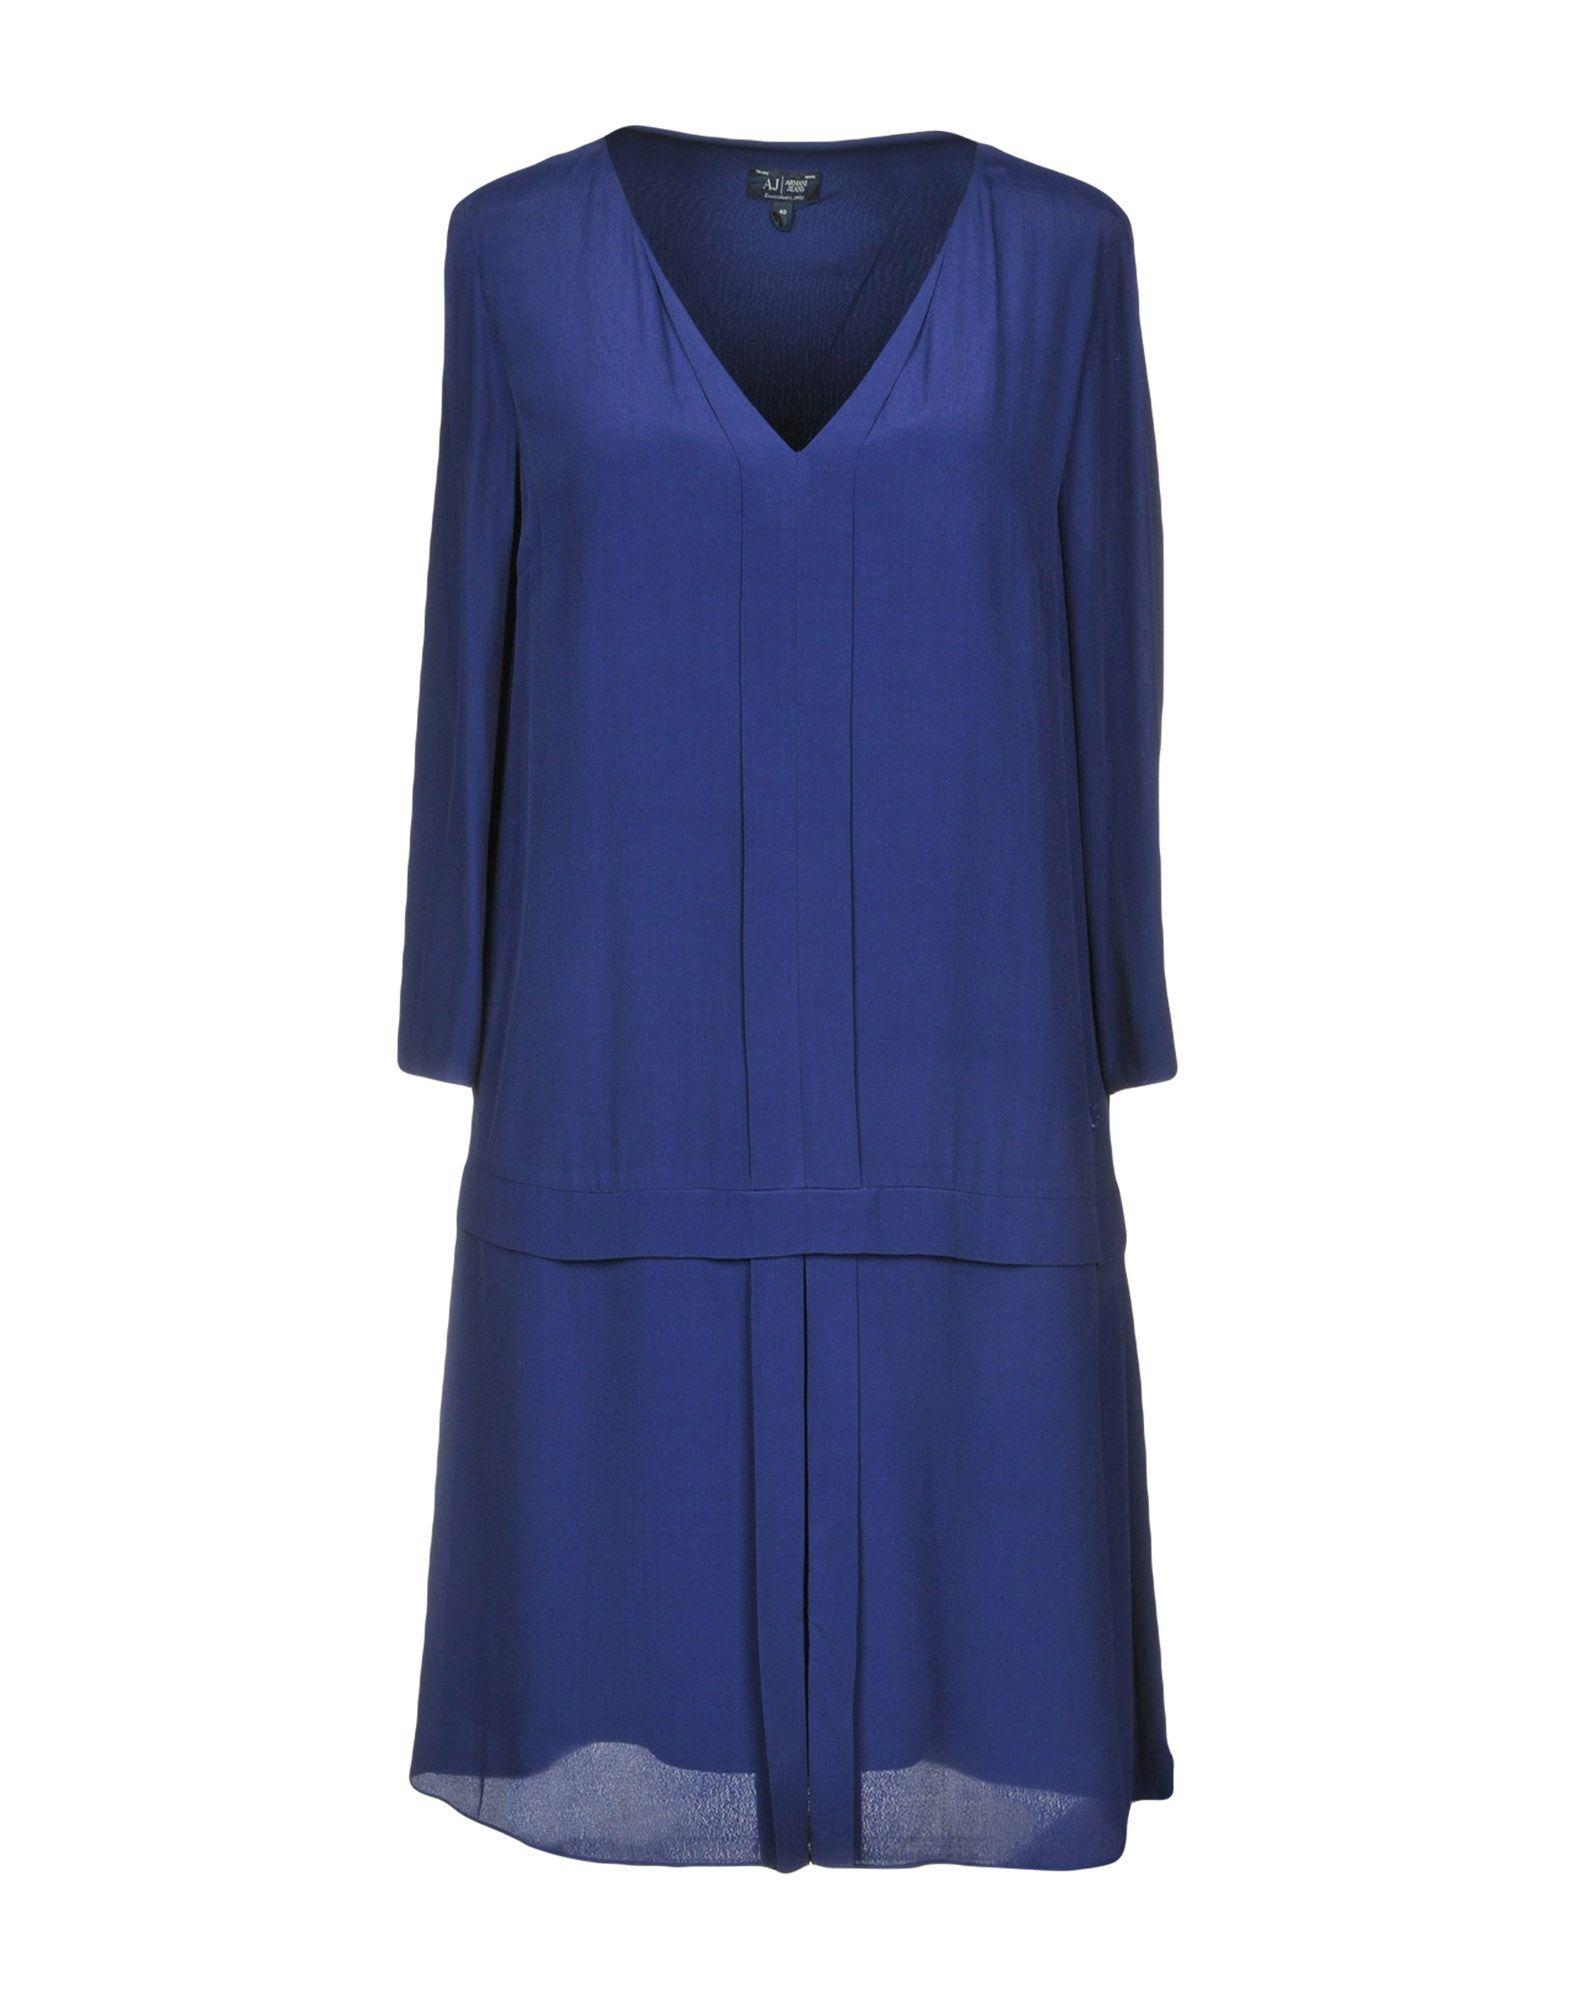 3ee57b889a6f Armani Jeans - Γυναικεία Φορέματα - Σελίδα 1